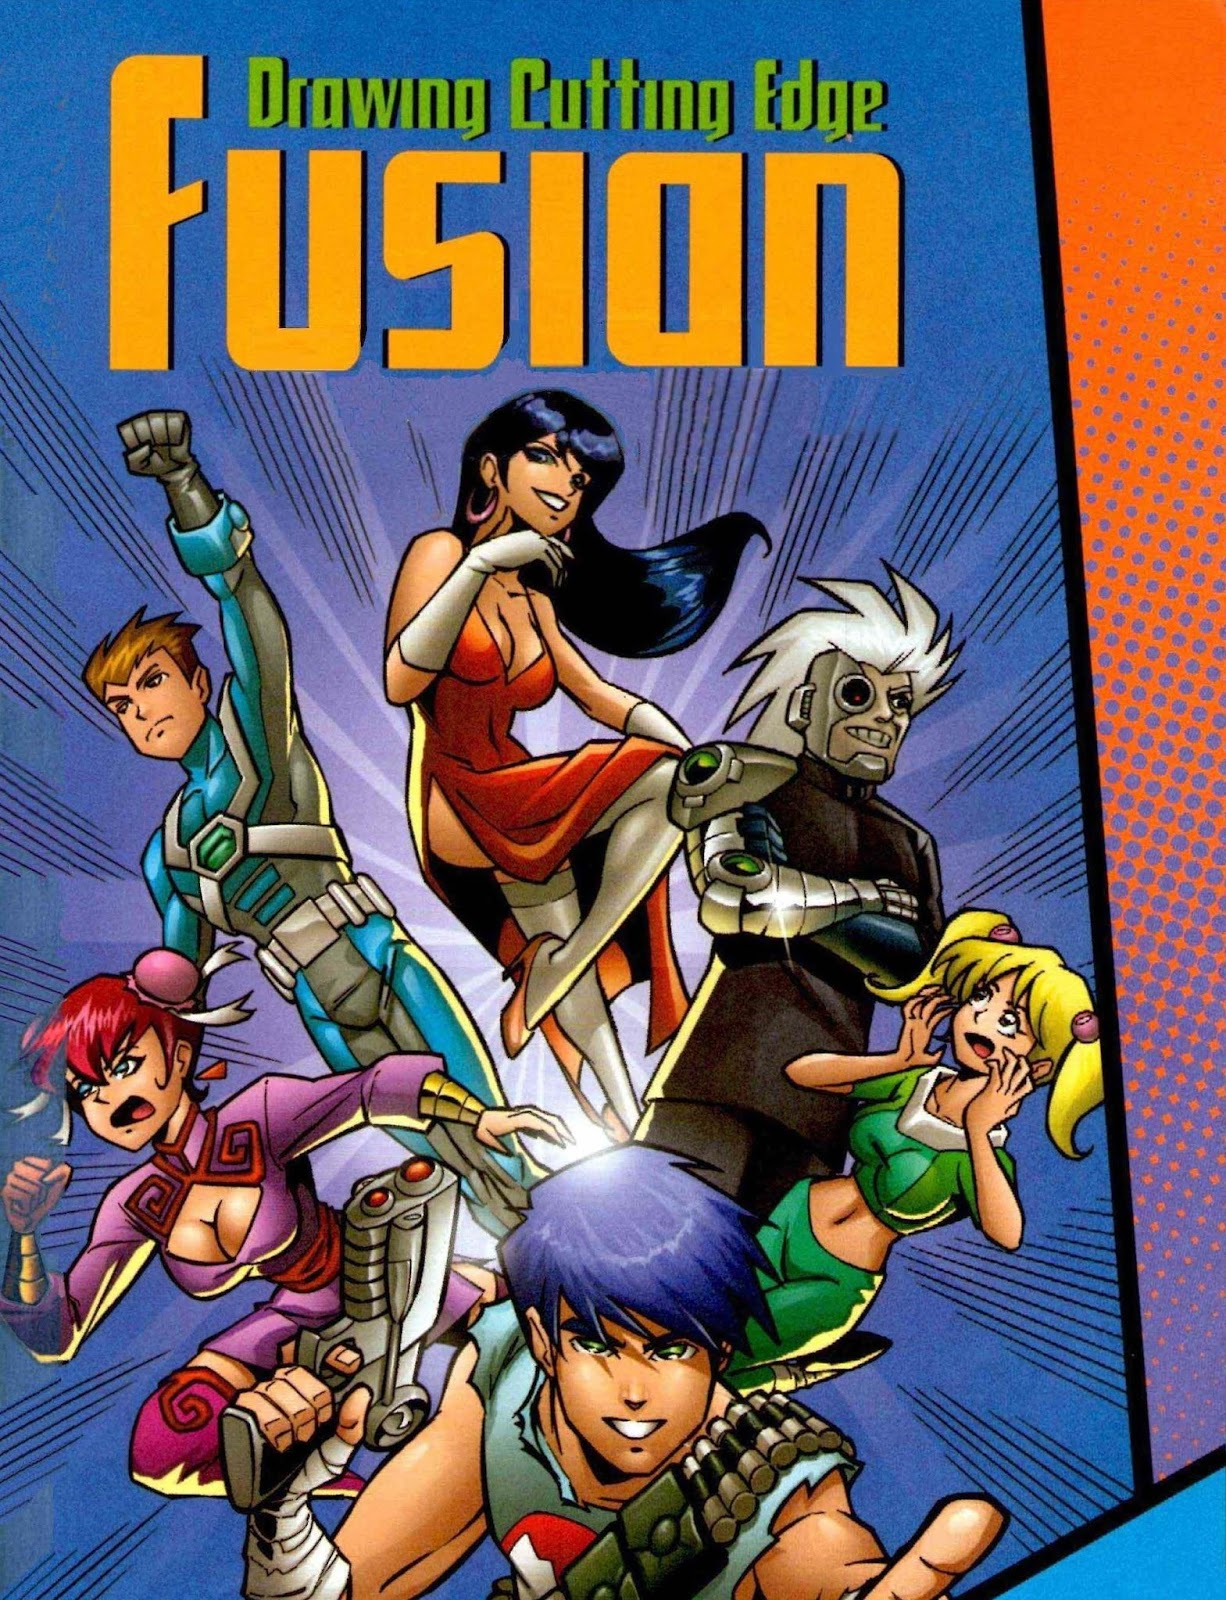 Drawing Cutting Edge Fusion | American Comics with a Manga Influence ...